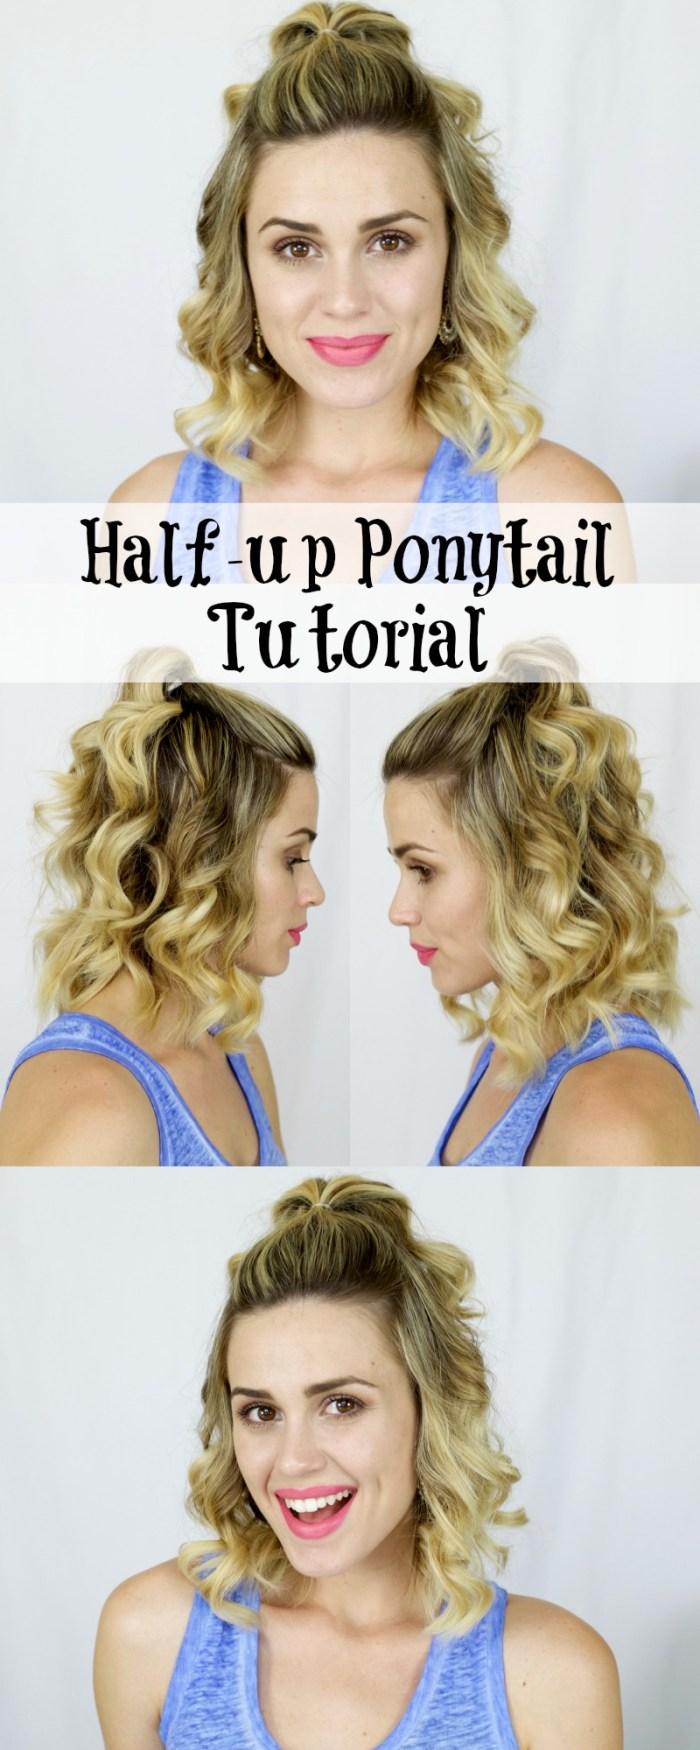 halfup ponytail tutorial